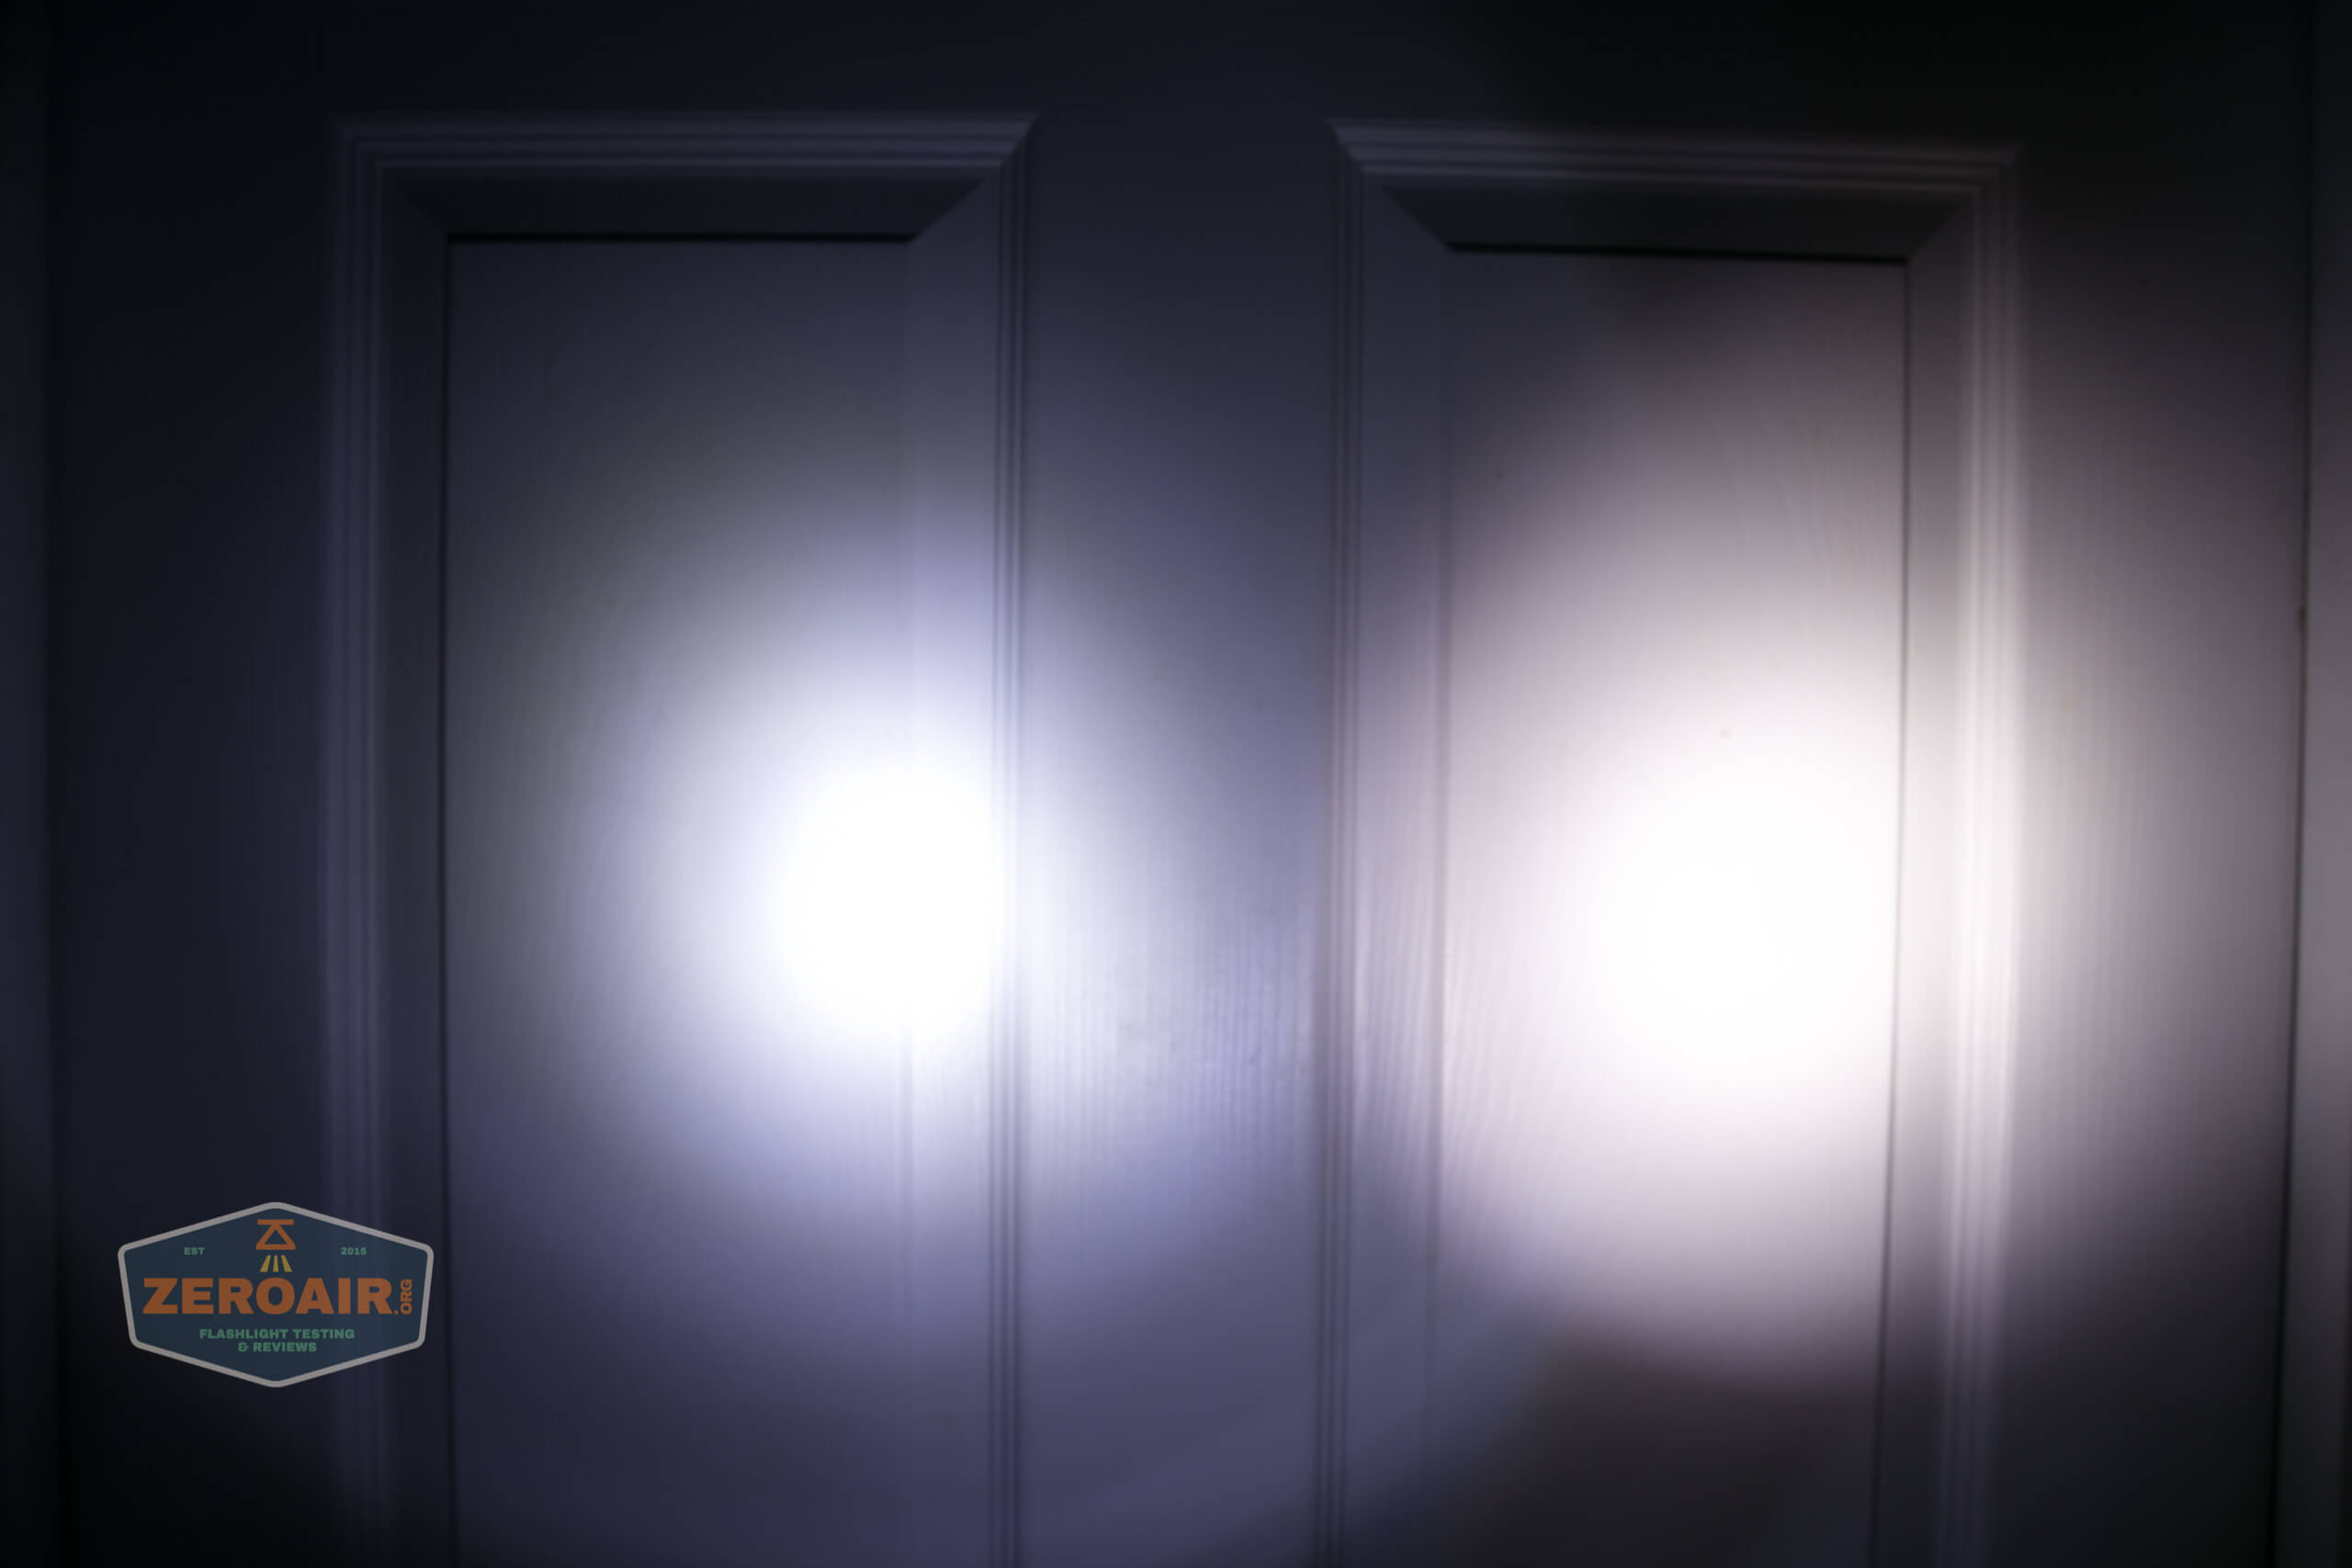 streamlight key-mate 72101 keychain twisty flashlight beamshot door